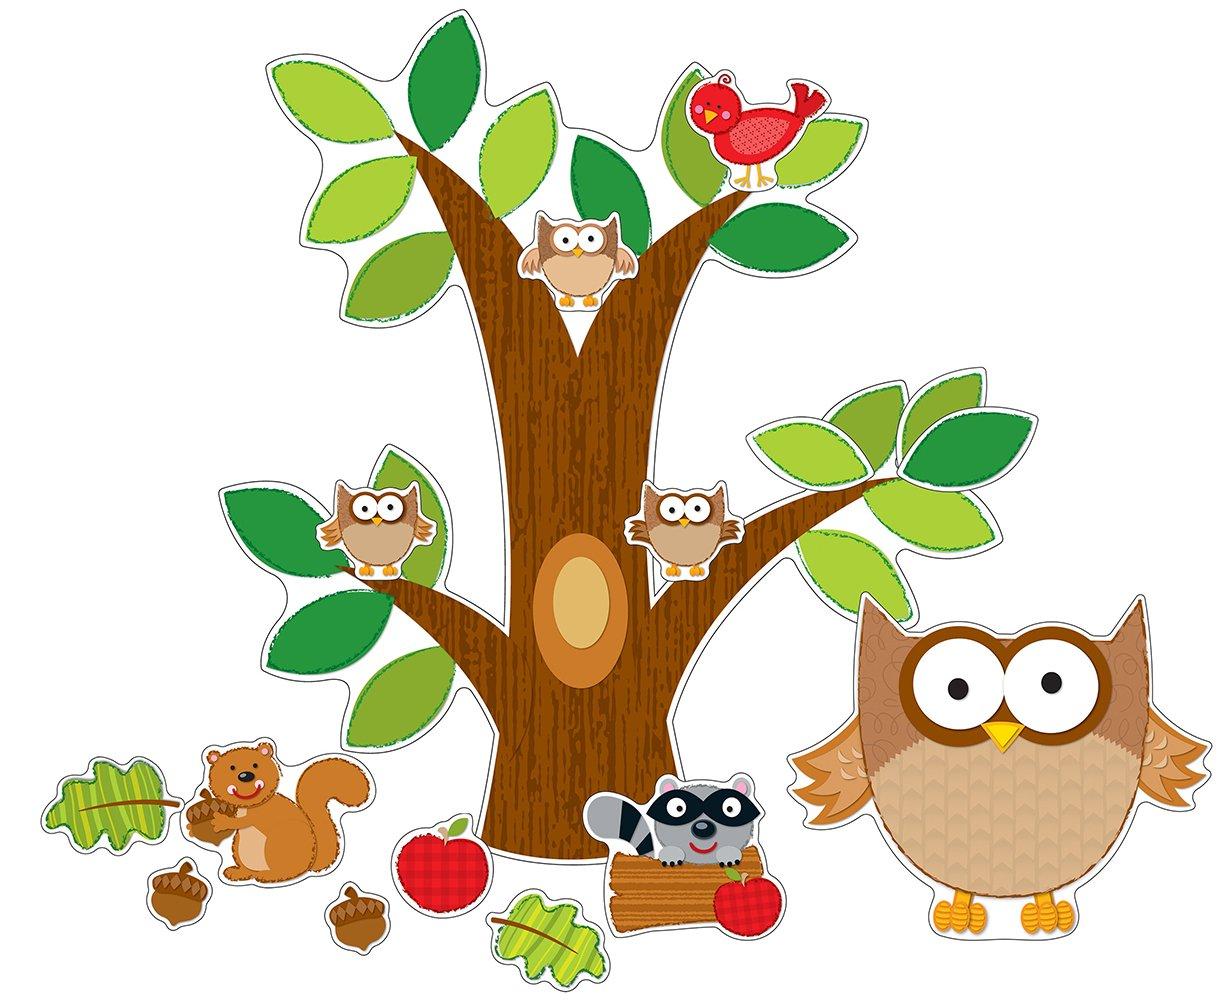 Carson Dellosa Owl Bulletin Board Set (110137) Carson-Dellosa Publishing Elementary Education Education / Elementary